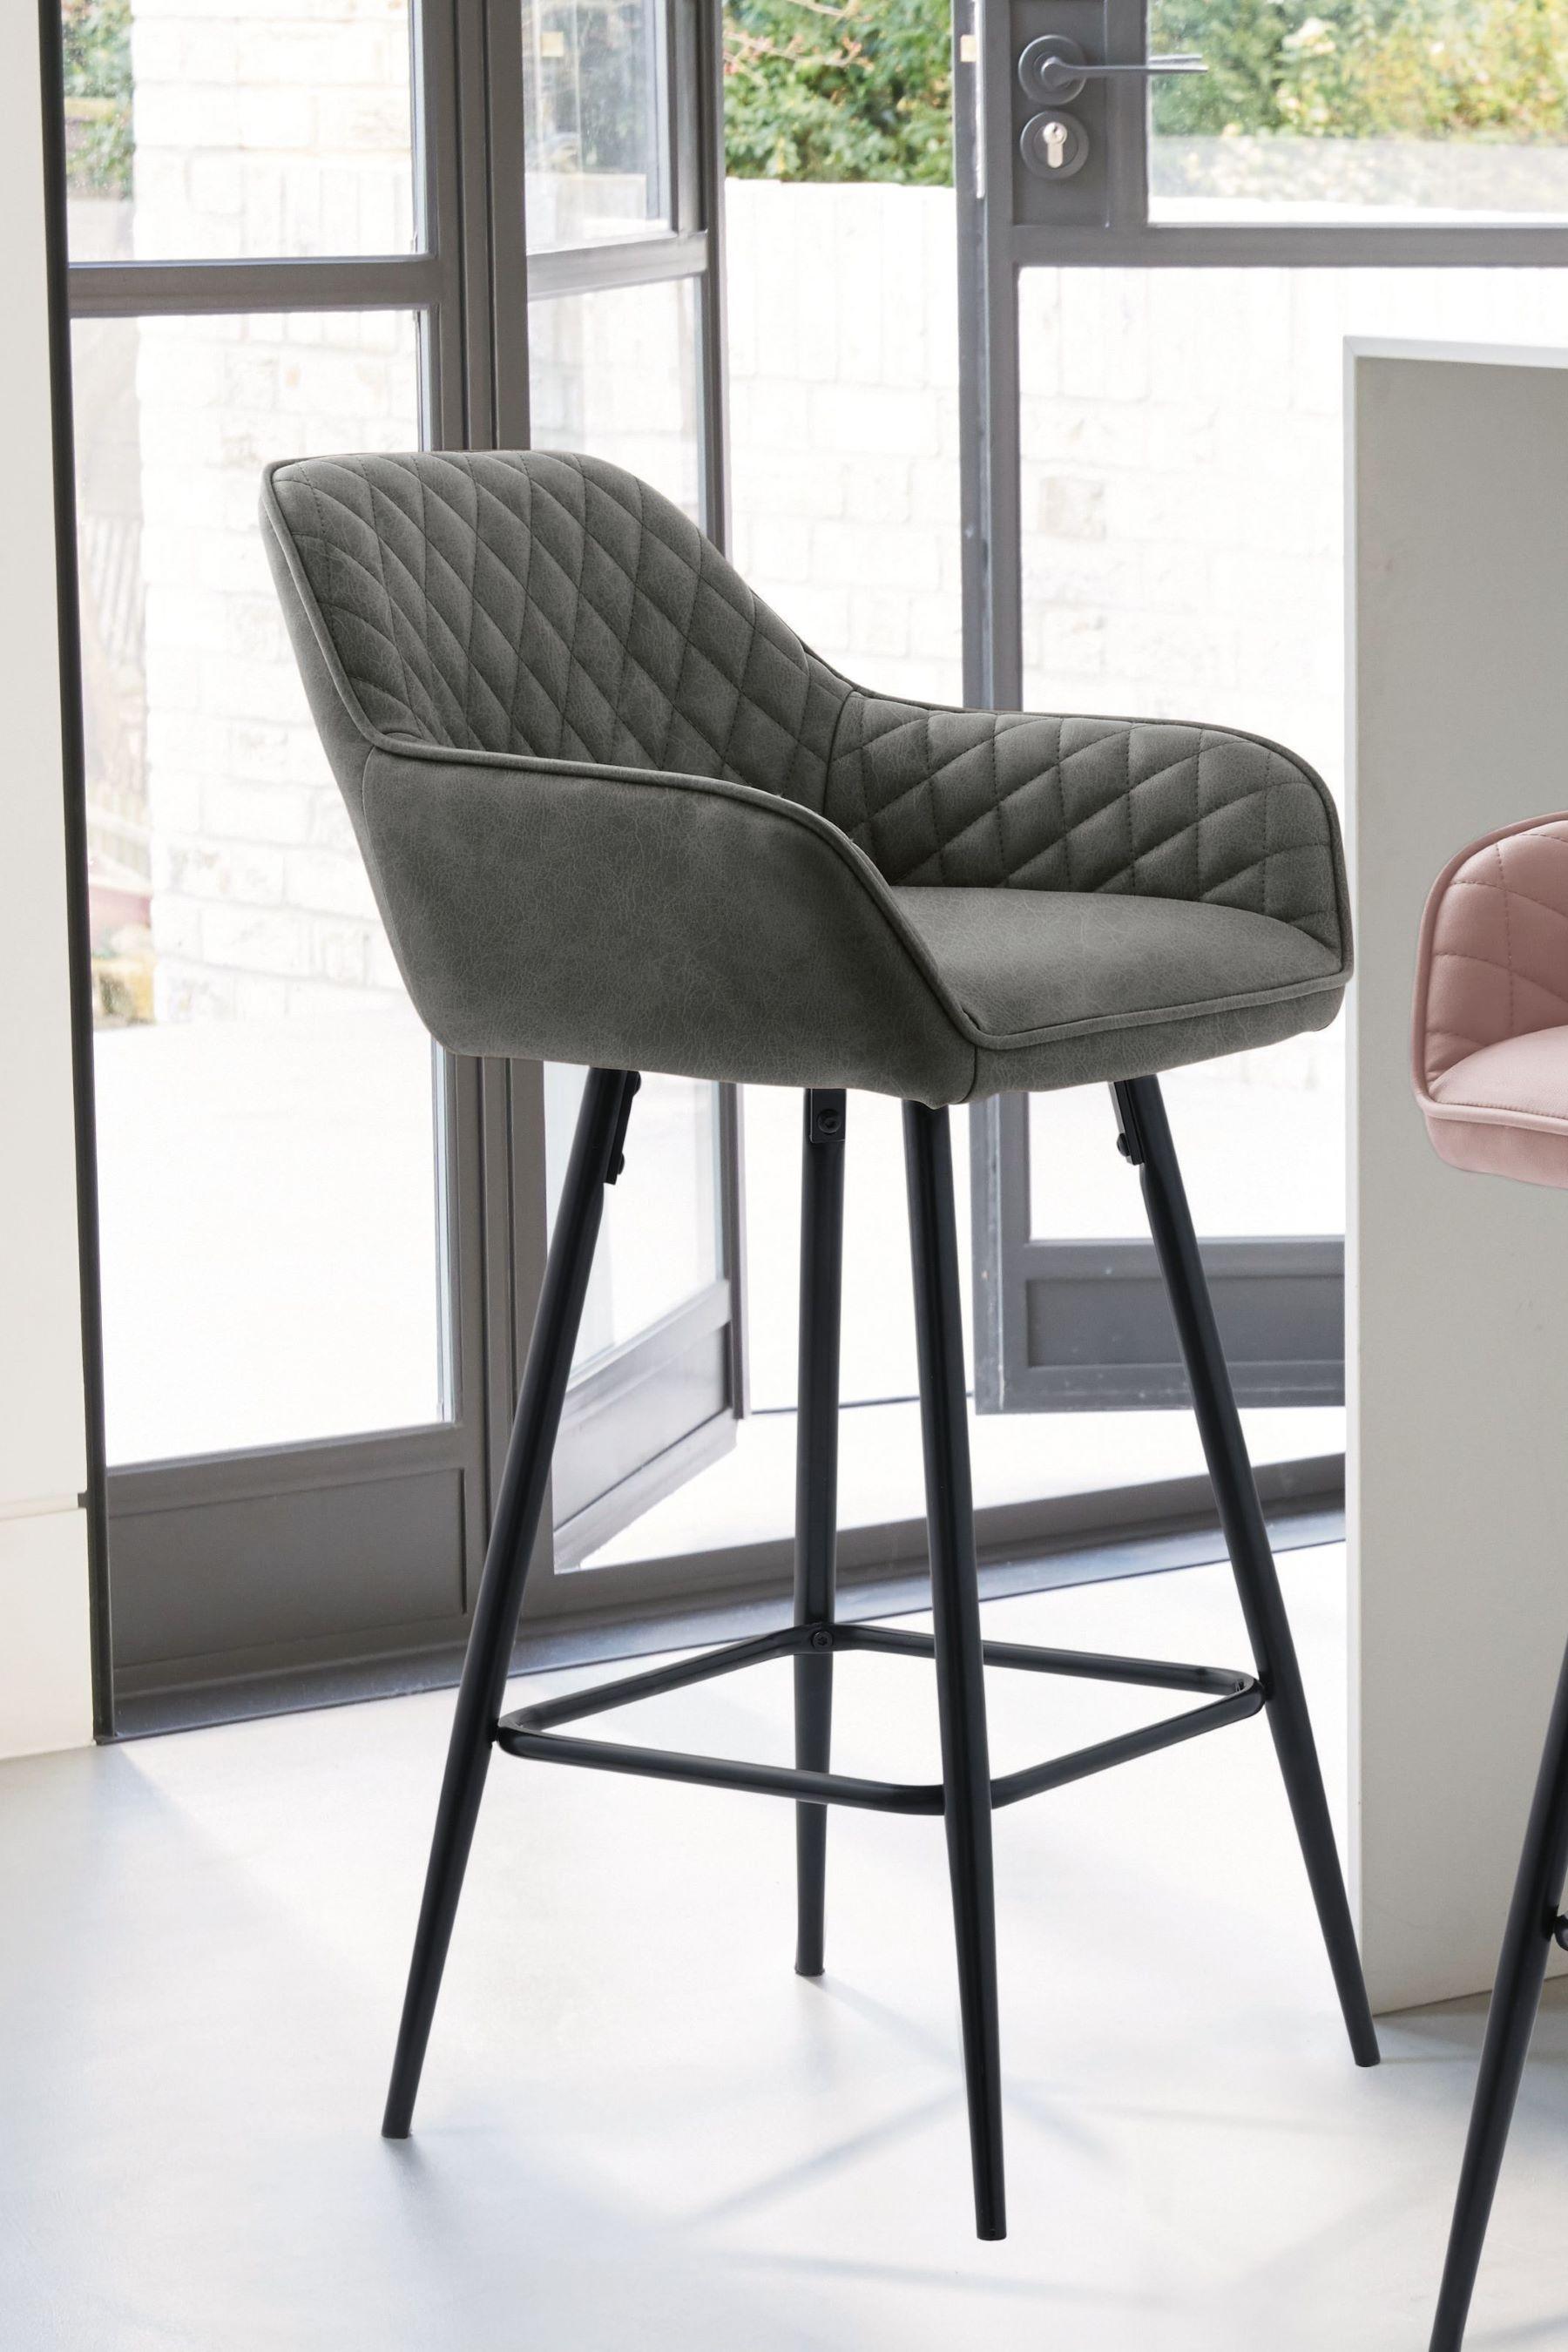 Magnificent Next Hamilton Bar Stool Grey In 2019 Bar Stools Fabric Dailytribune Chair Design For Home Dailytribuneorg